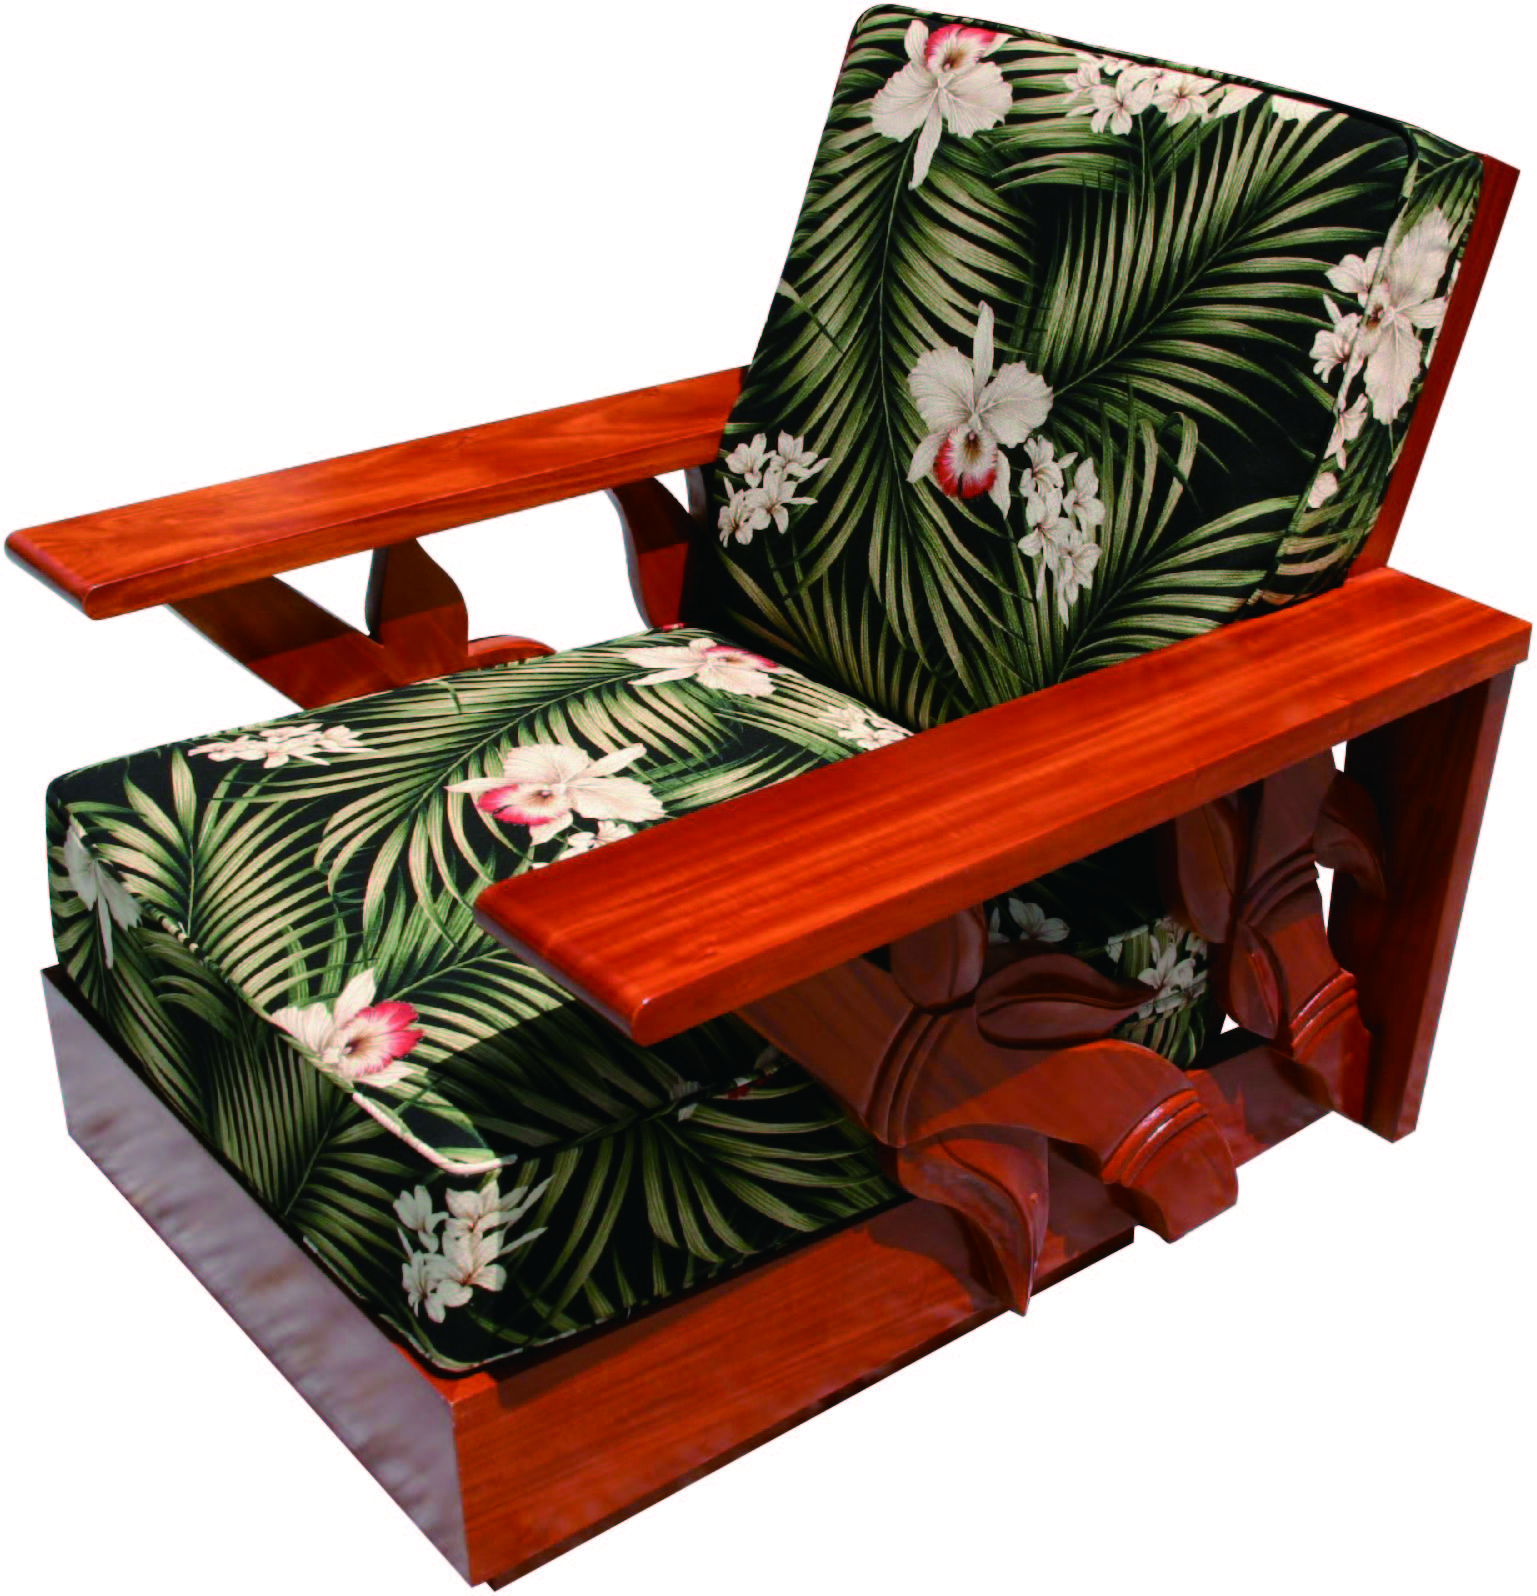 Mahogany side carving sofa 1 piece